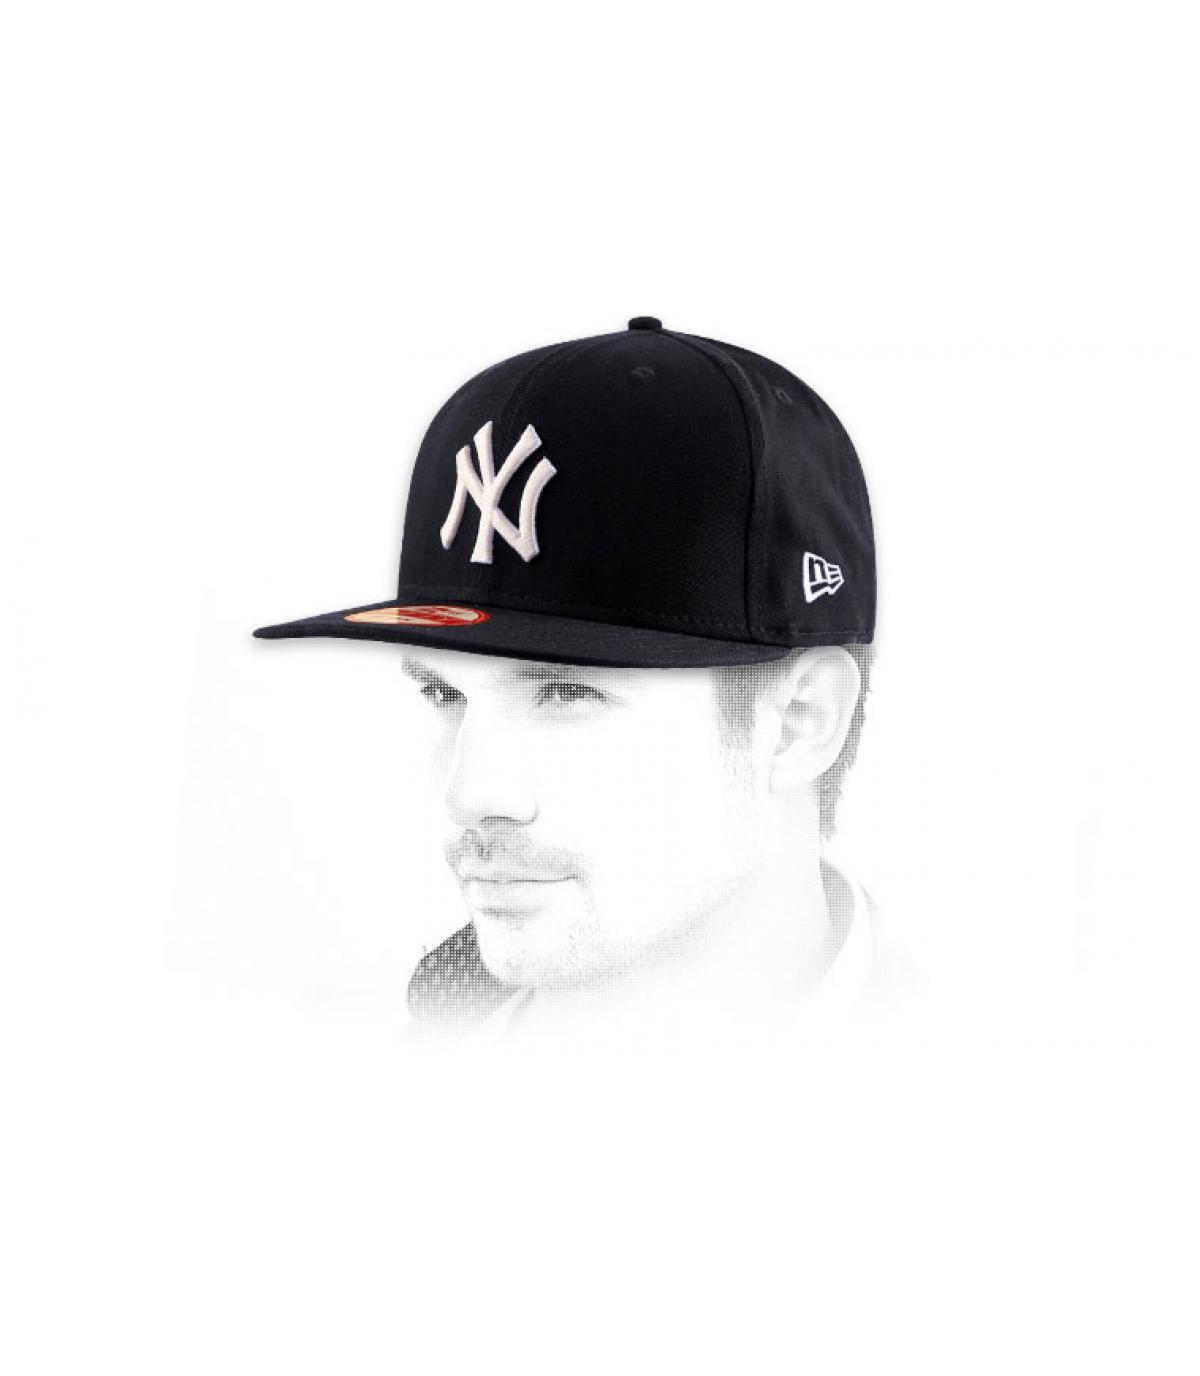 Détails Snapback NY team - image 7